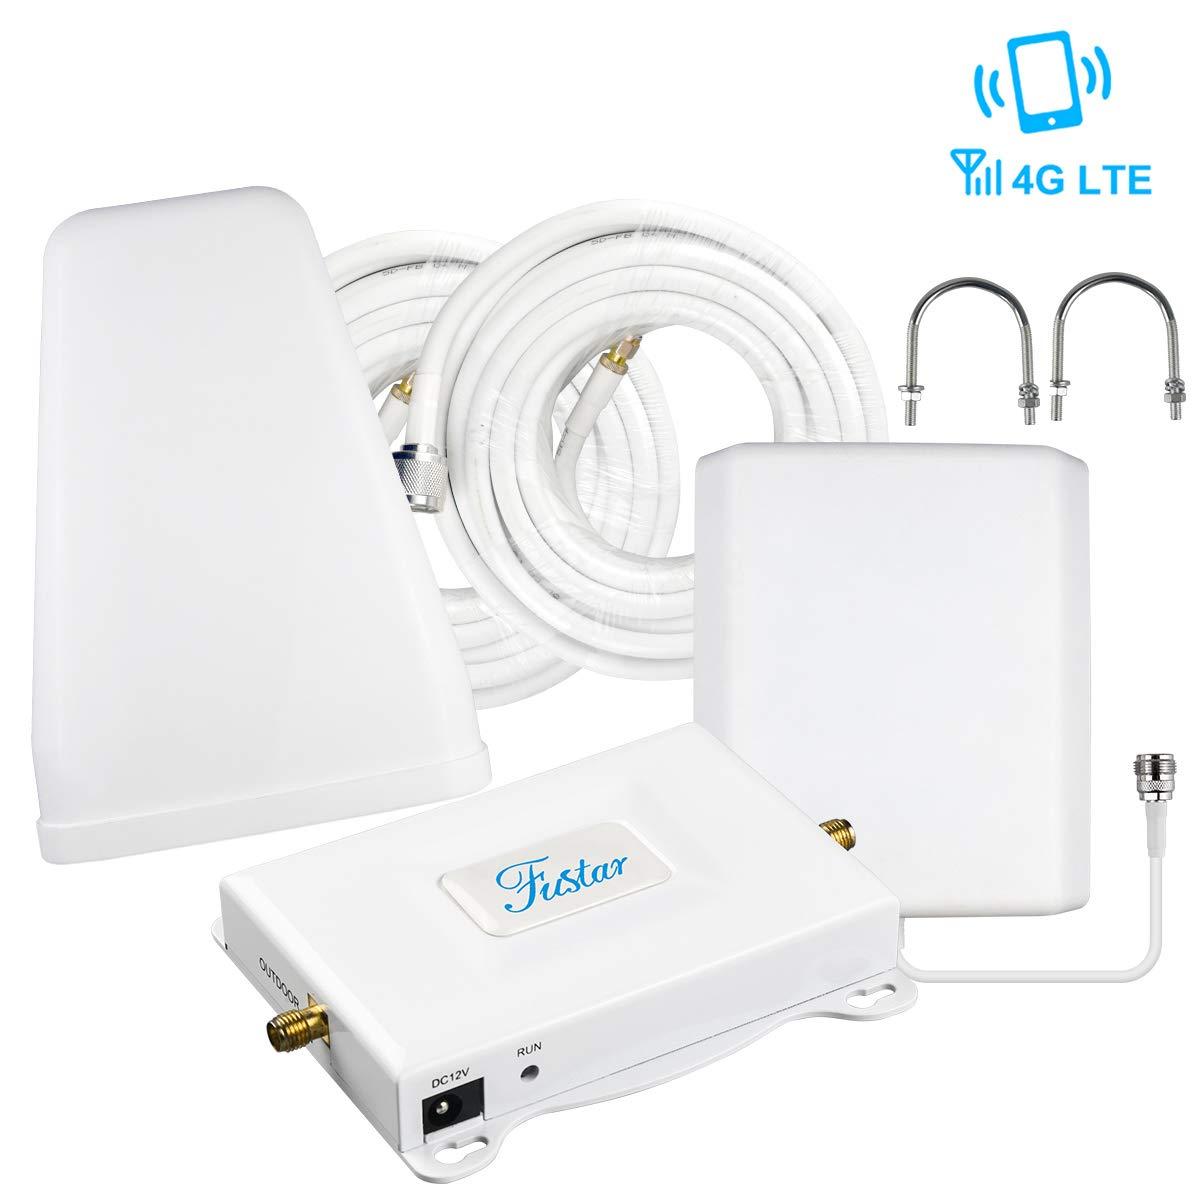 Verizon Cell Phone Signal Booster, Verizon Signal Booster - 4G LTE 700mhz Band 13 Verizon Booster,Cell Phone Amplifier Network Extender - 65dB 5000sq.ft,Stronger Gain Reception Antenna Pannel+LPDA by FUSTAR